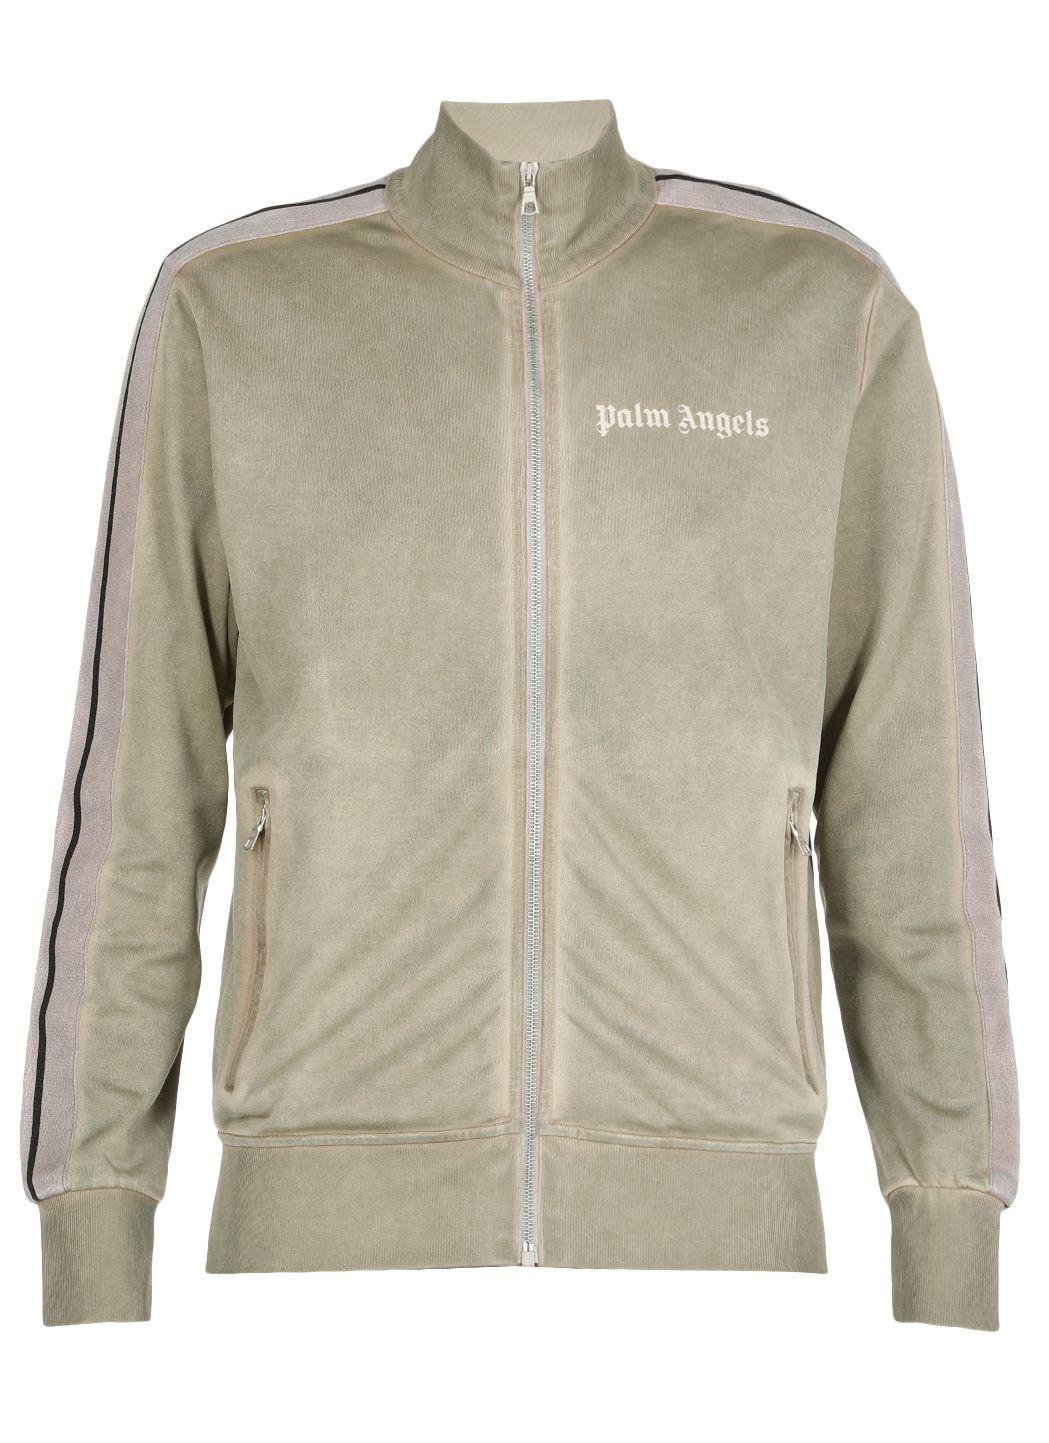 Garment dyed track jacket